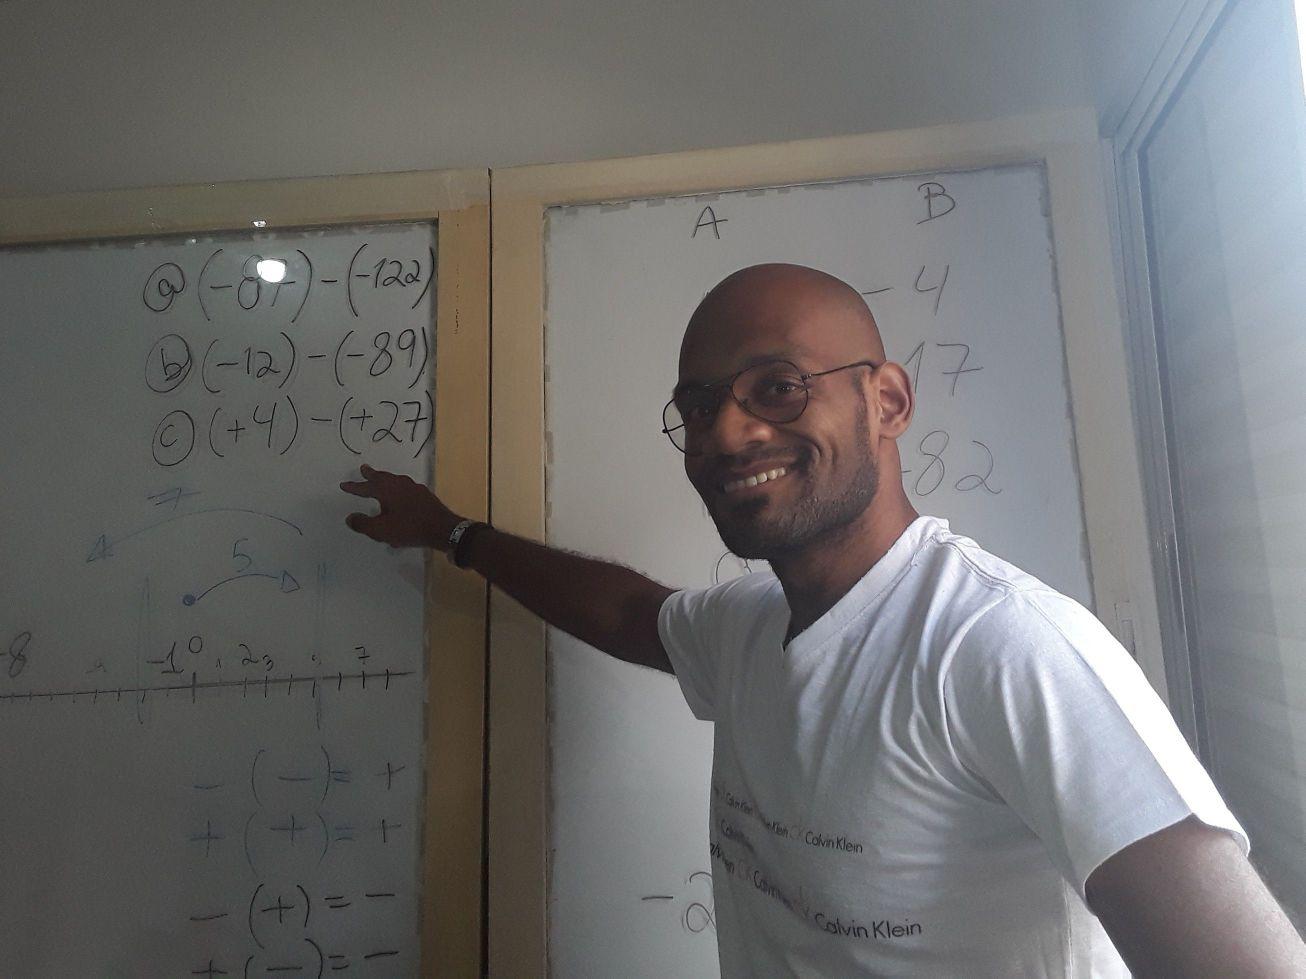 conversa sobre matemática